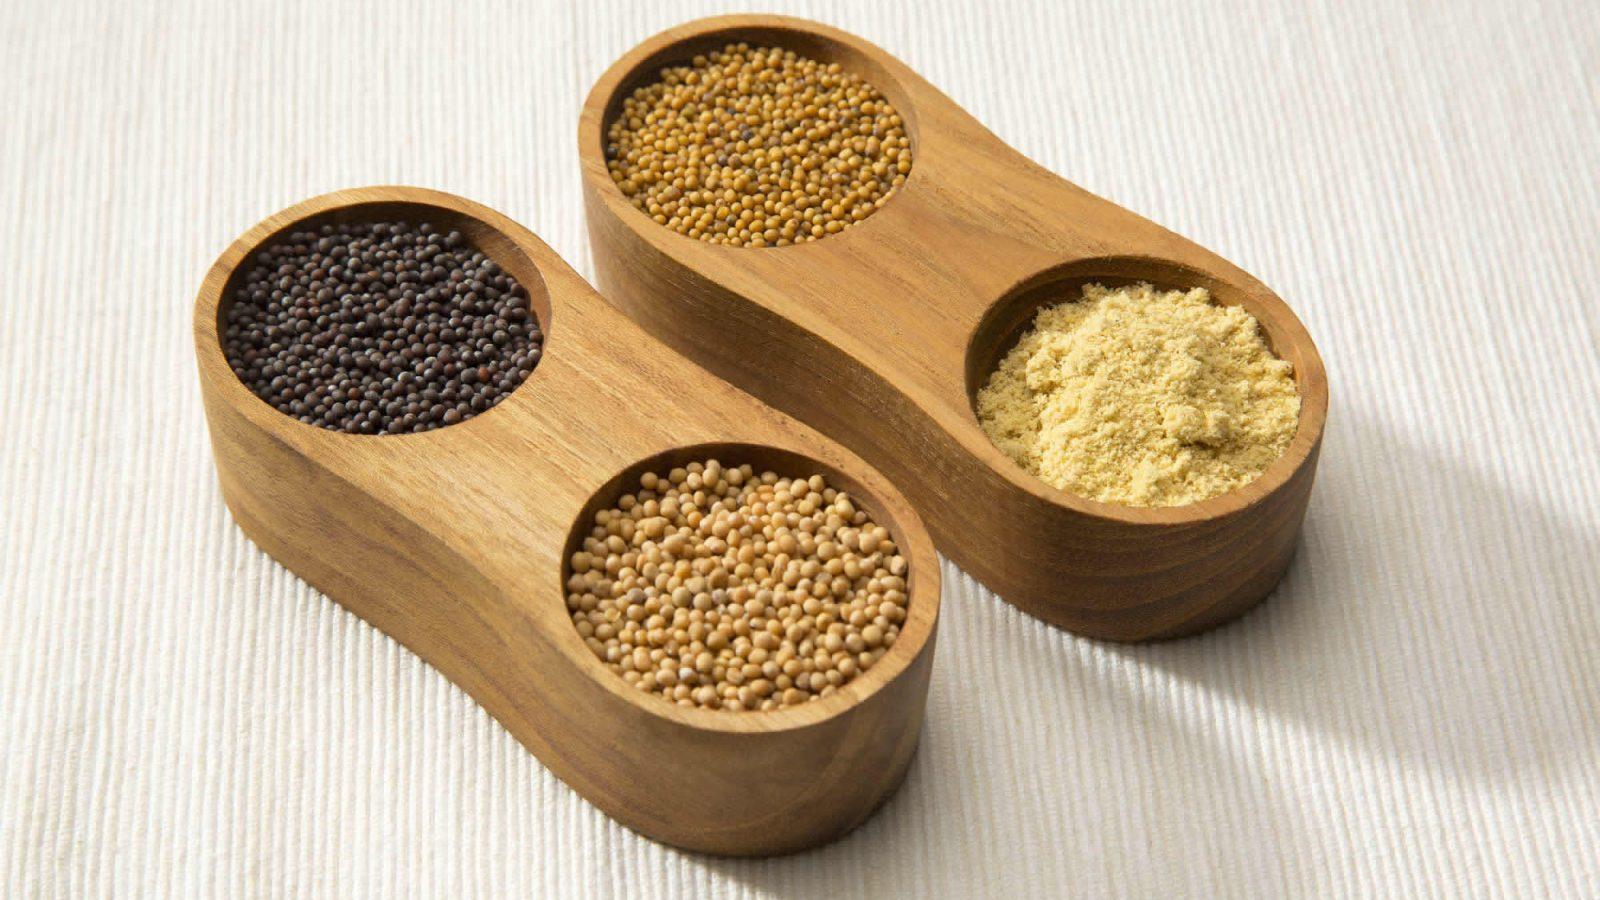 Mustard seed and Mustard Powder